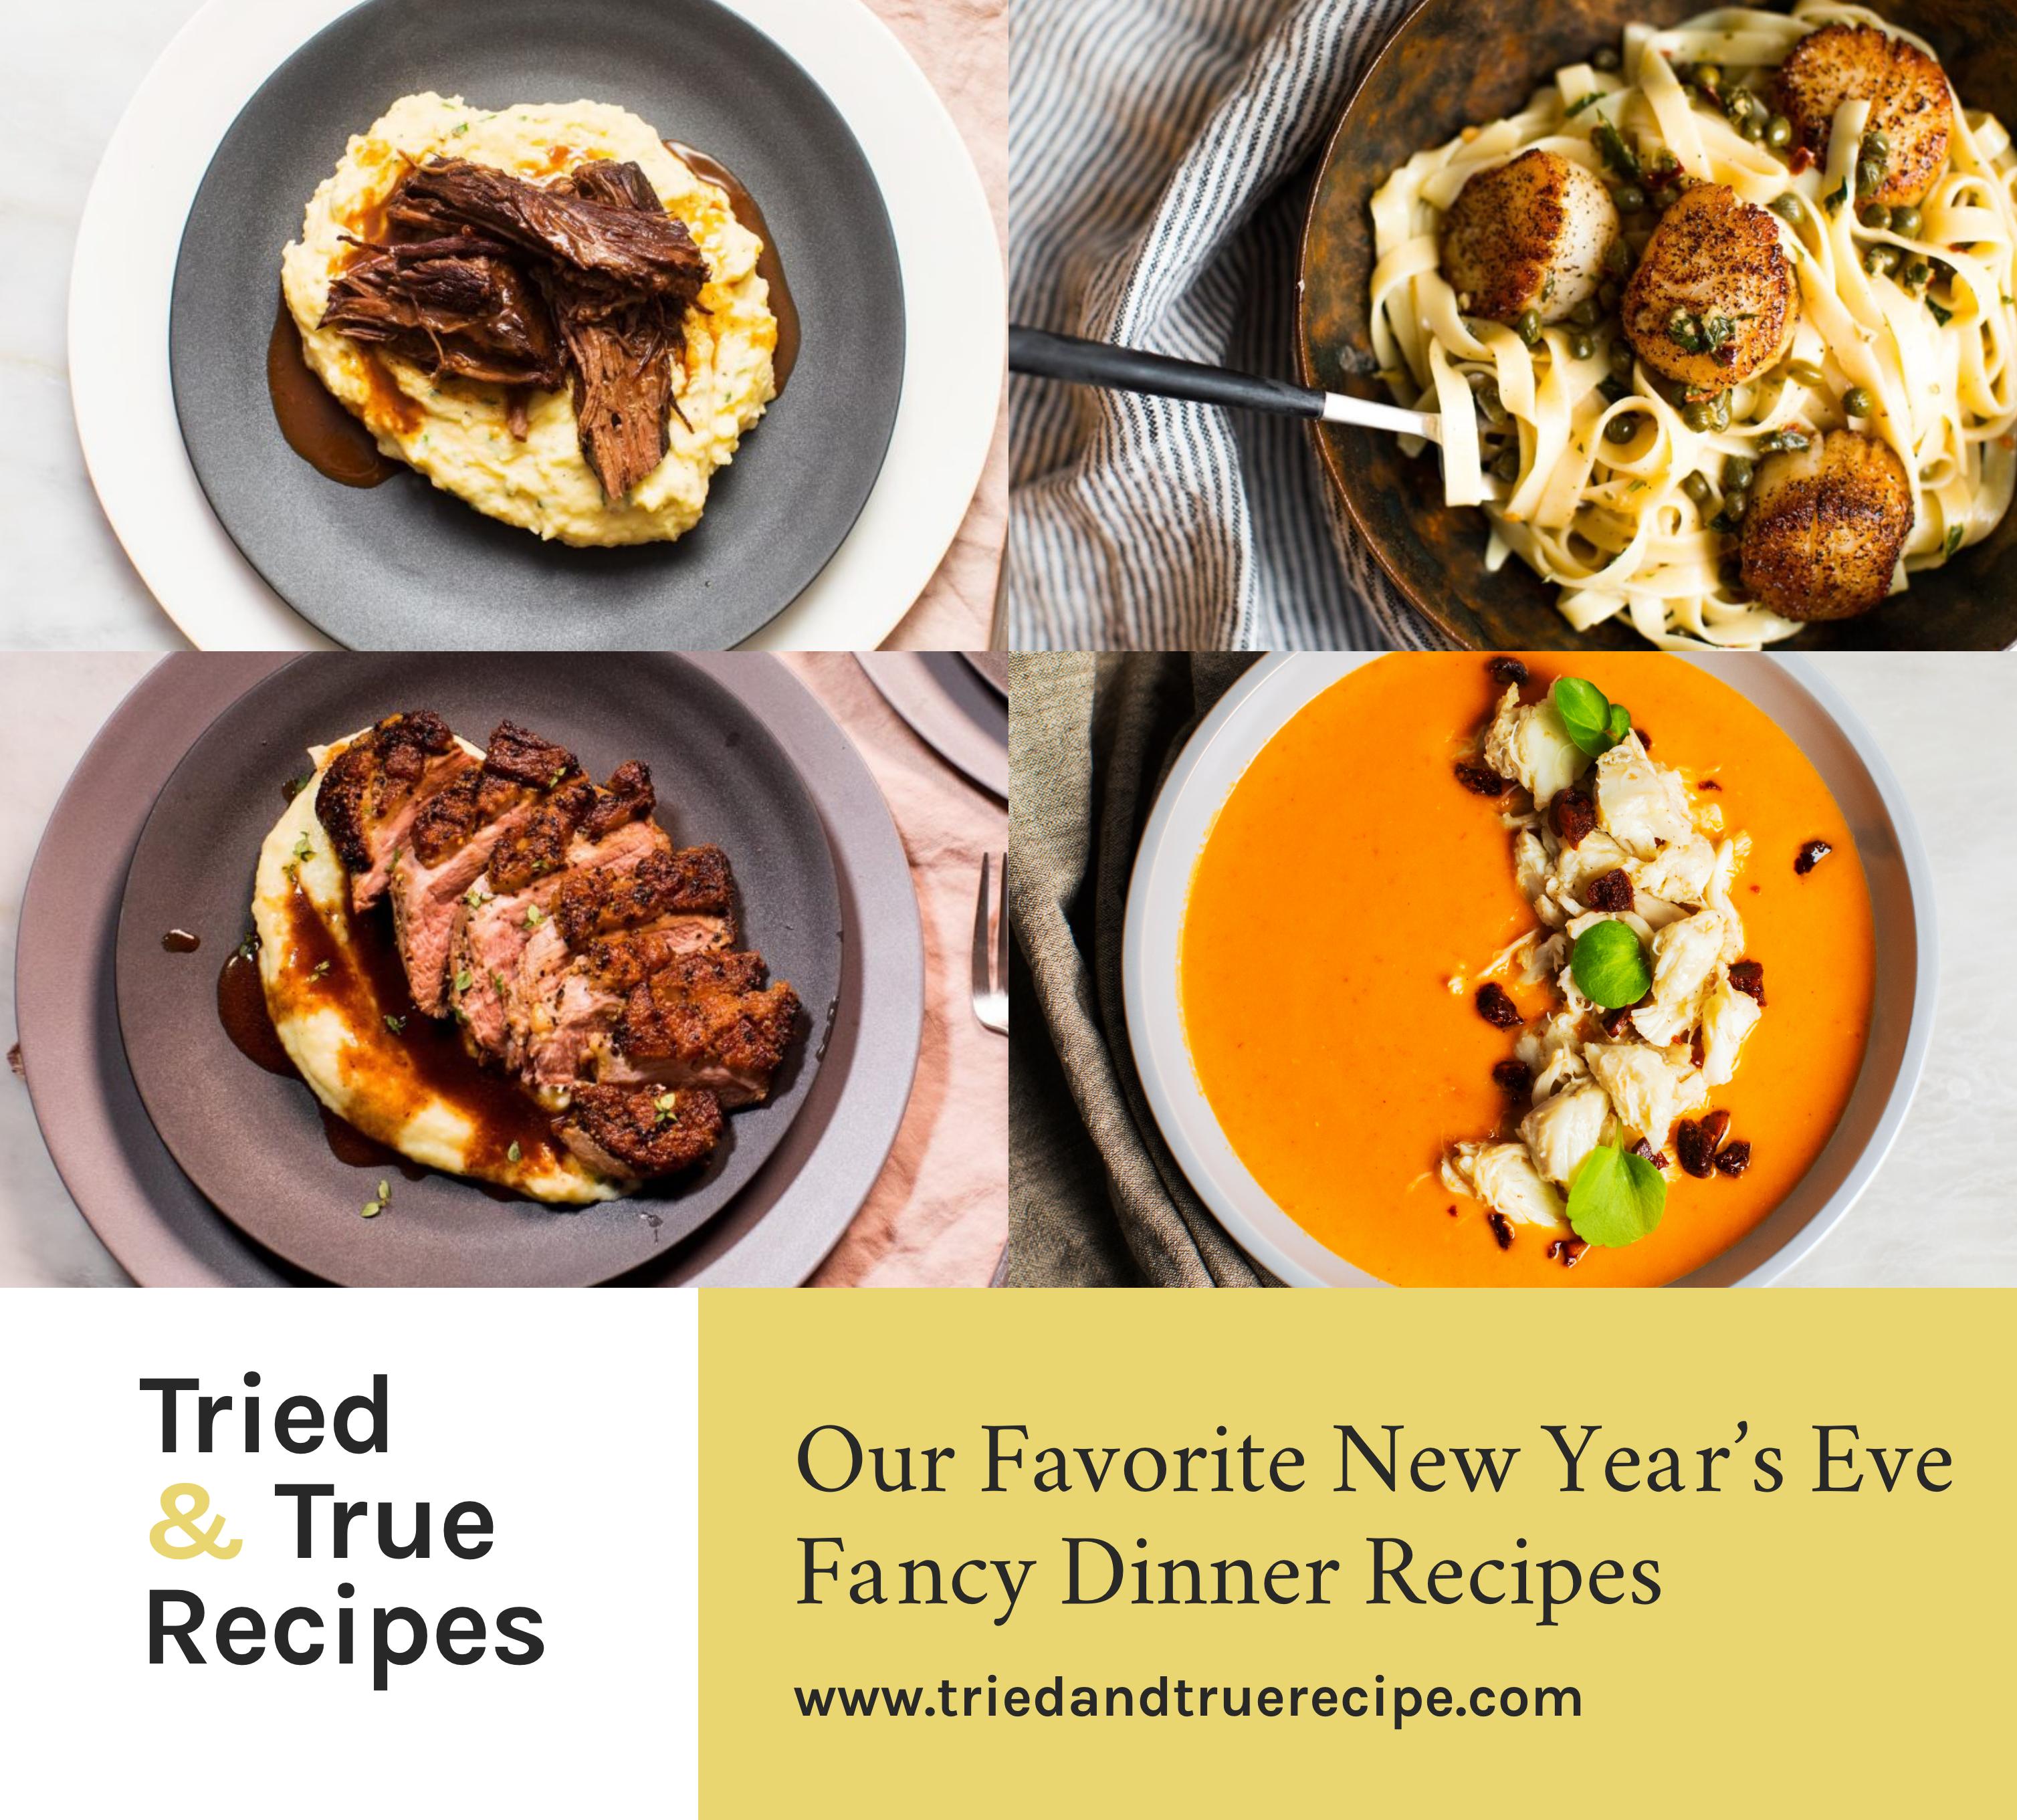 My Favorite New Year S Eve Fancy Dinner Recipes Dinner Steak And Lobster Dinner Fancy Dinner Recipes